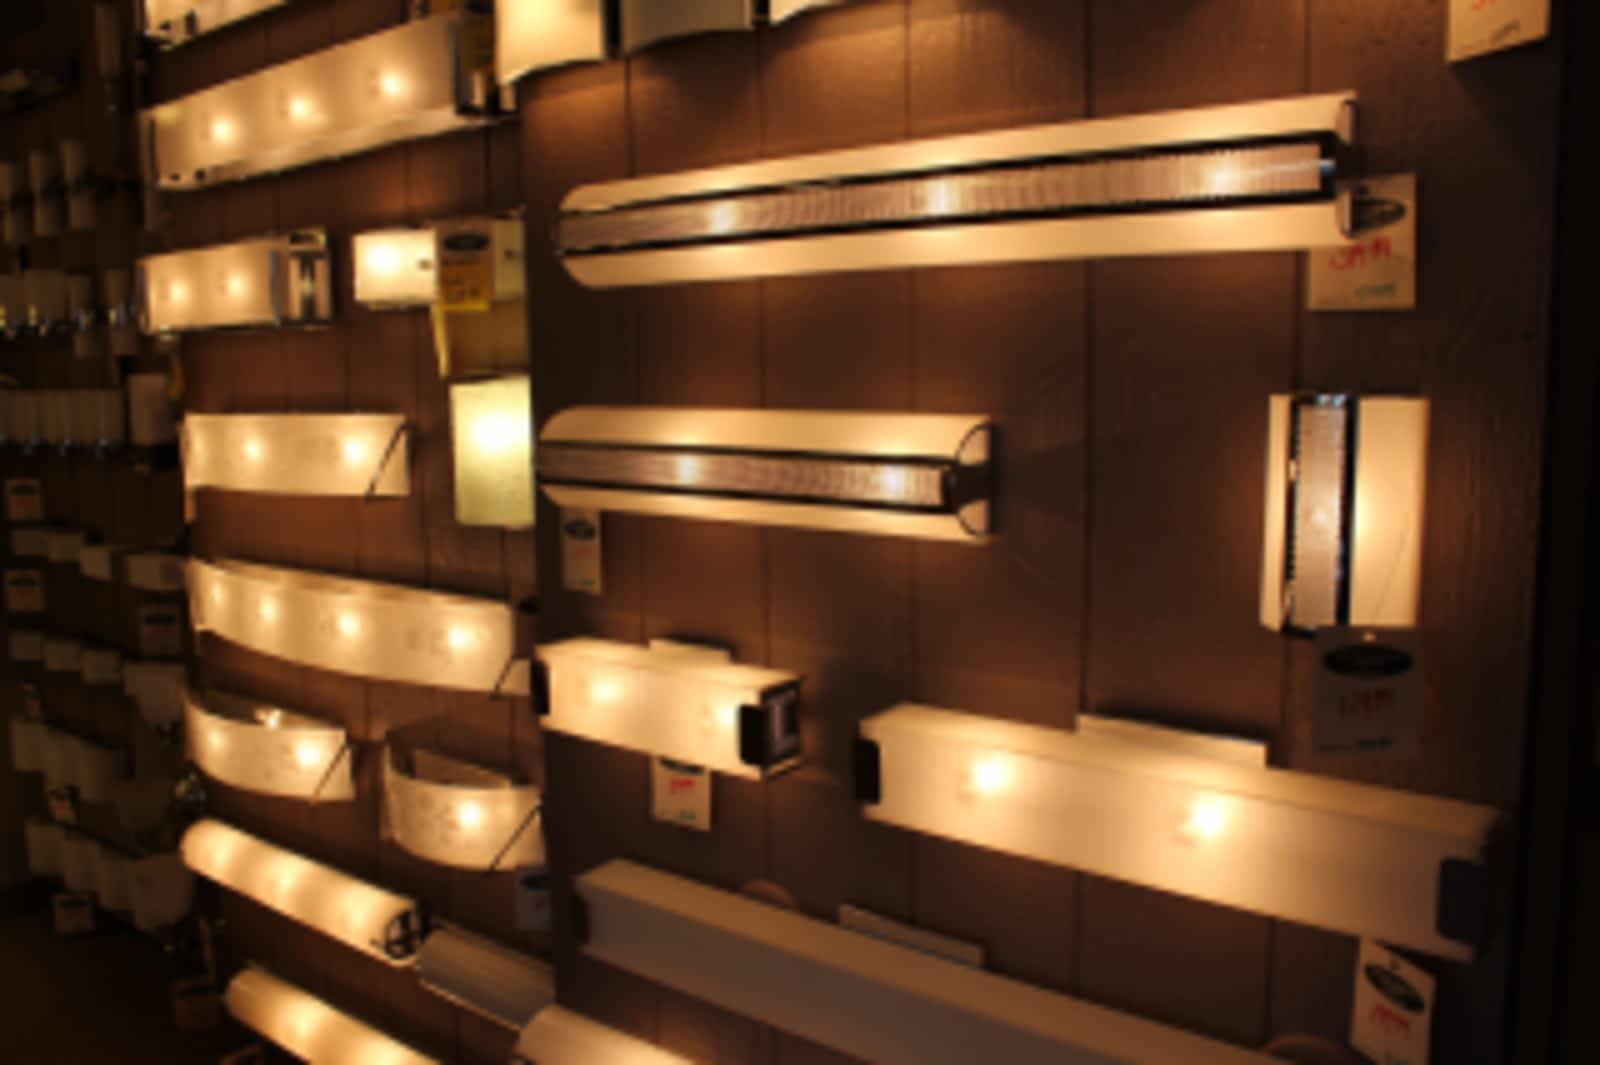 Chateau lighting opening hours 4355 99 st nw edmonton ab